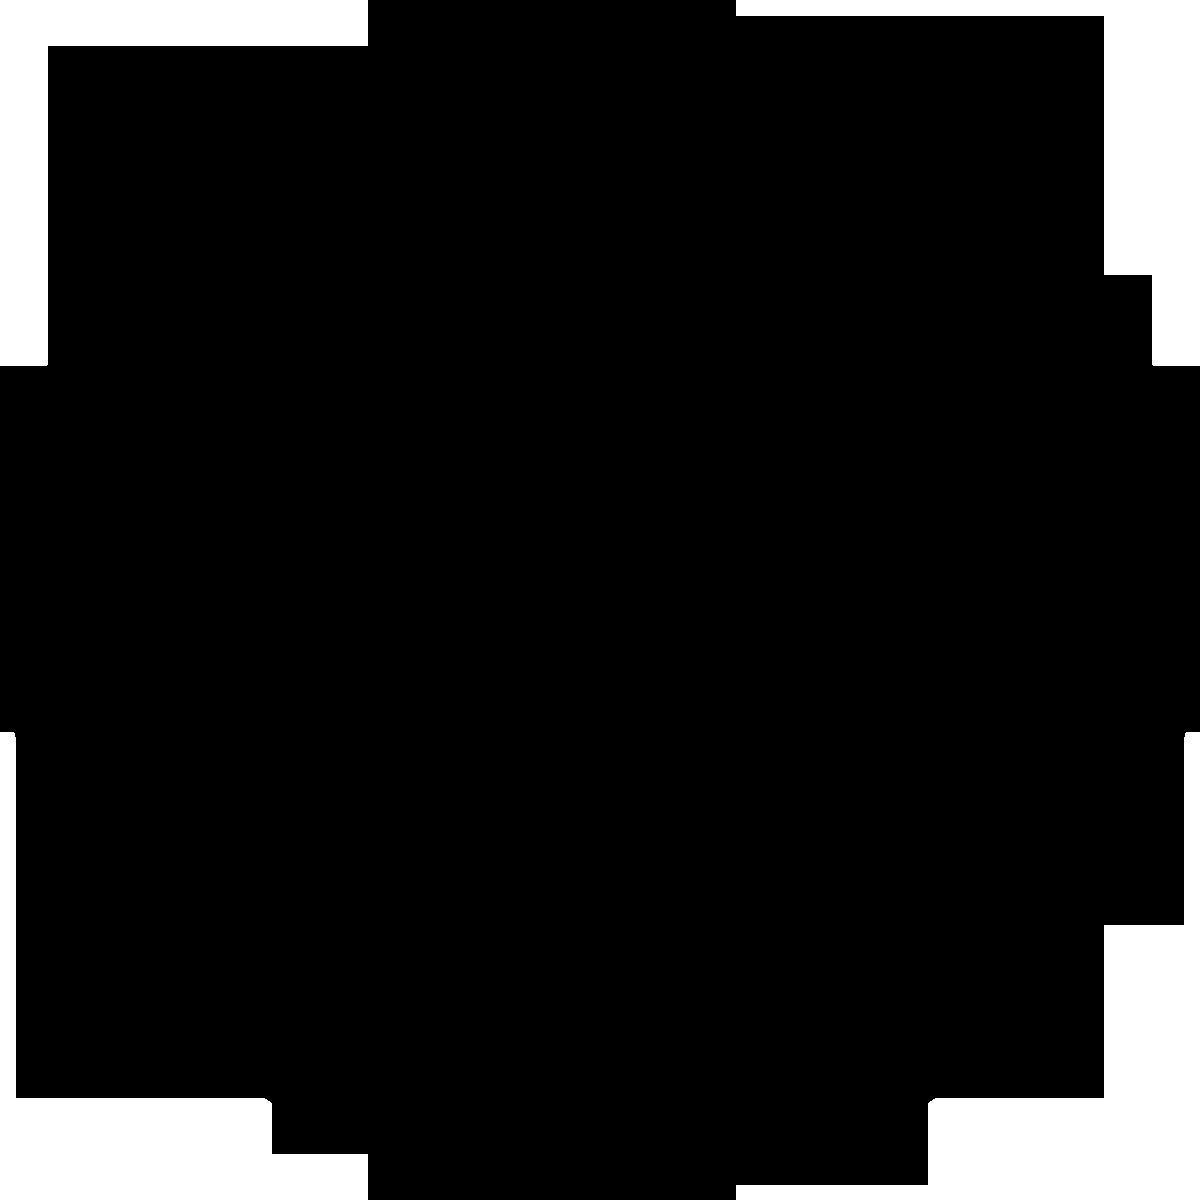 Mortal Kombat silhouette.png